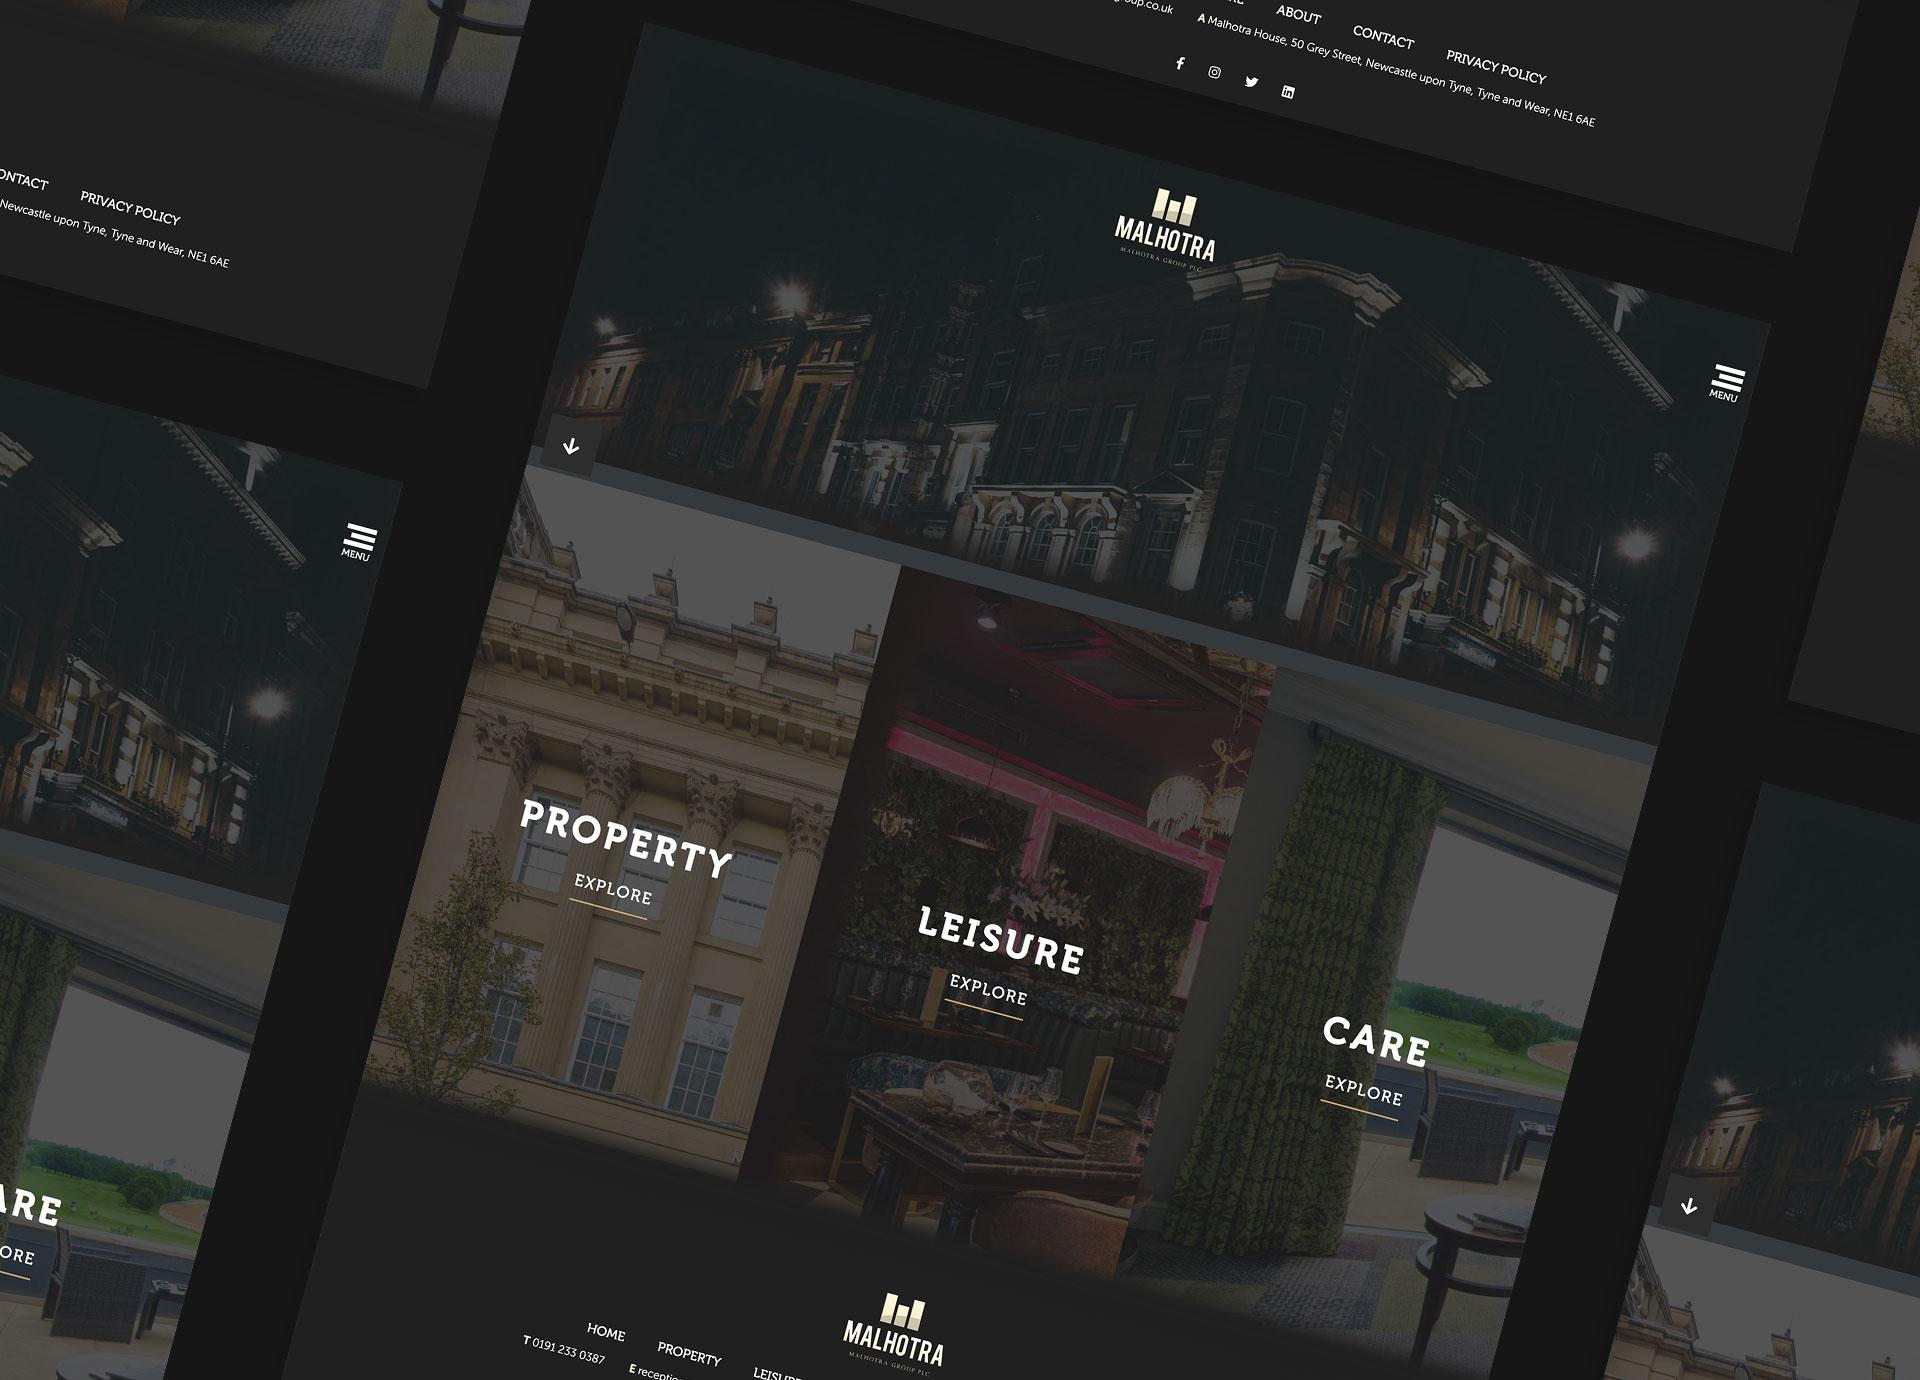 Malhotra Group website design